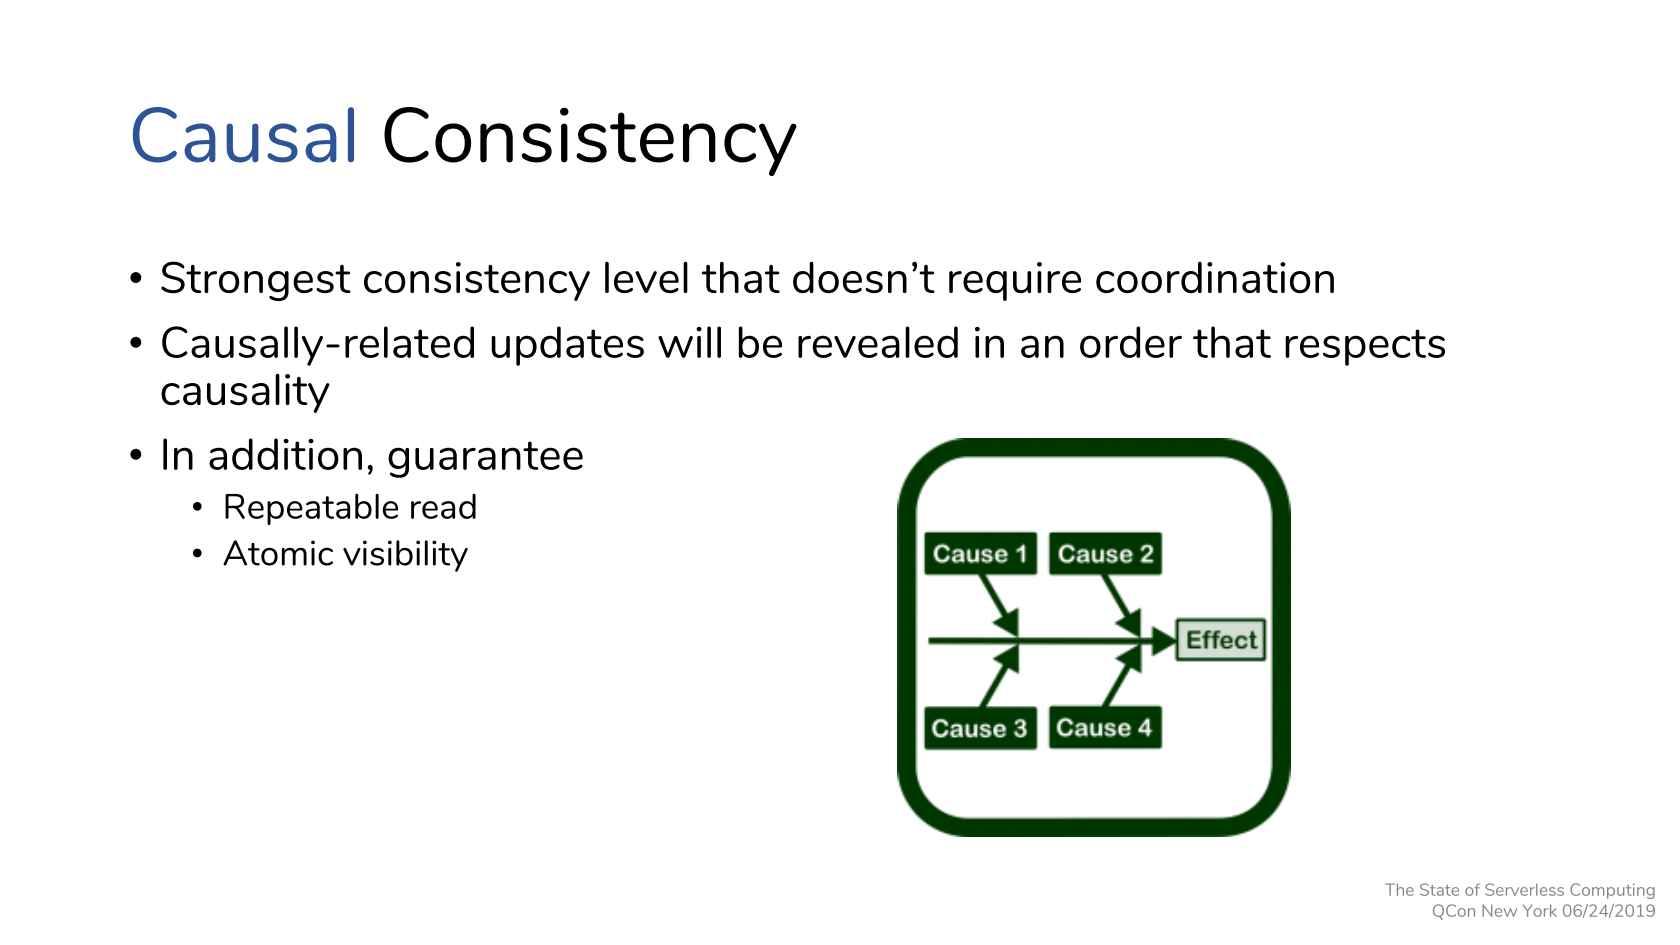 The State of Serverless Computing